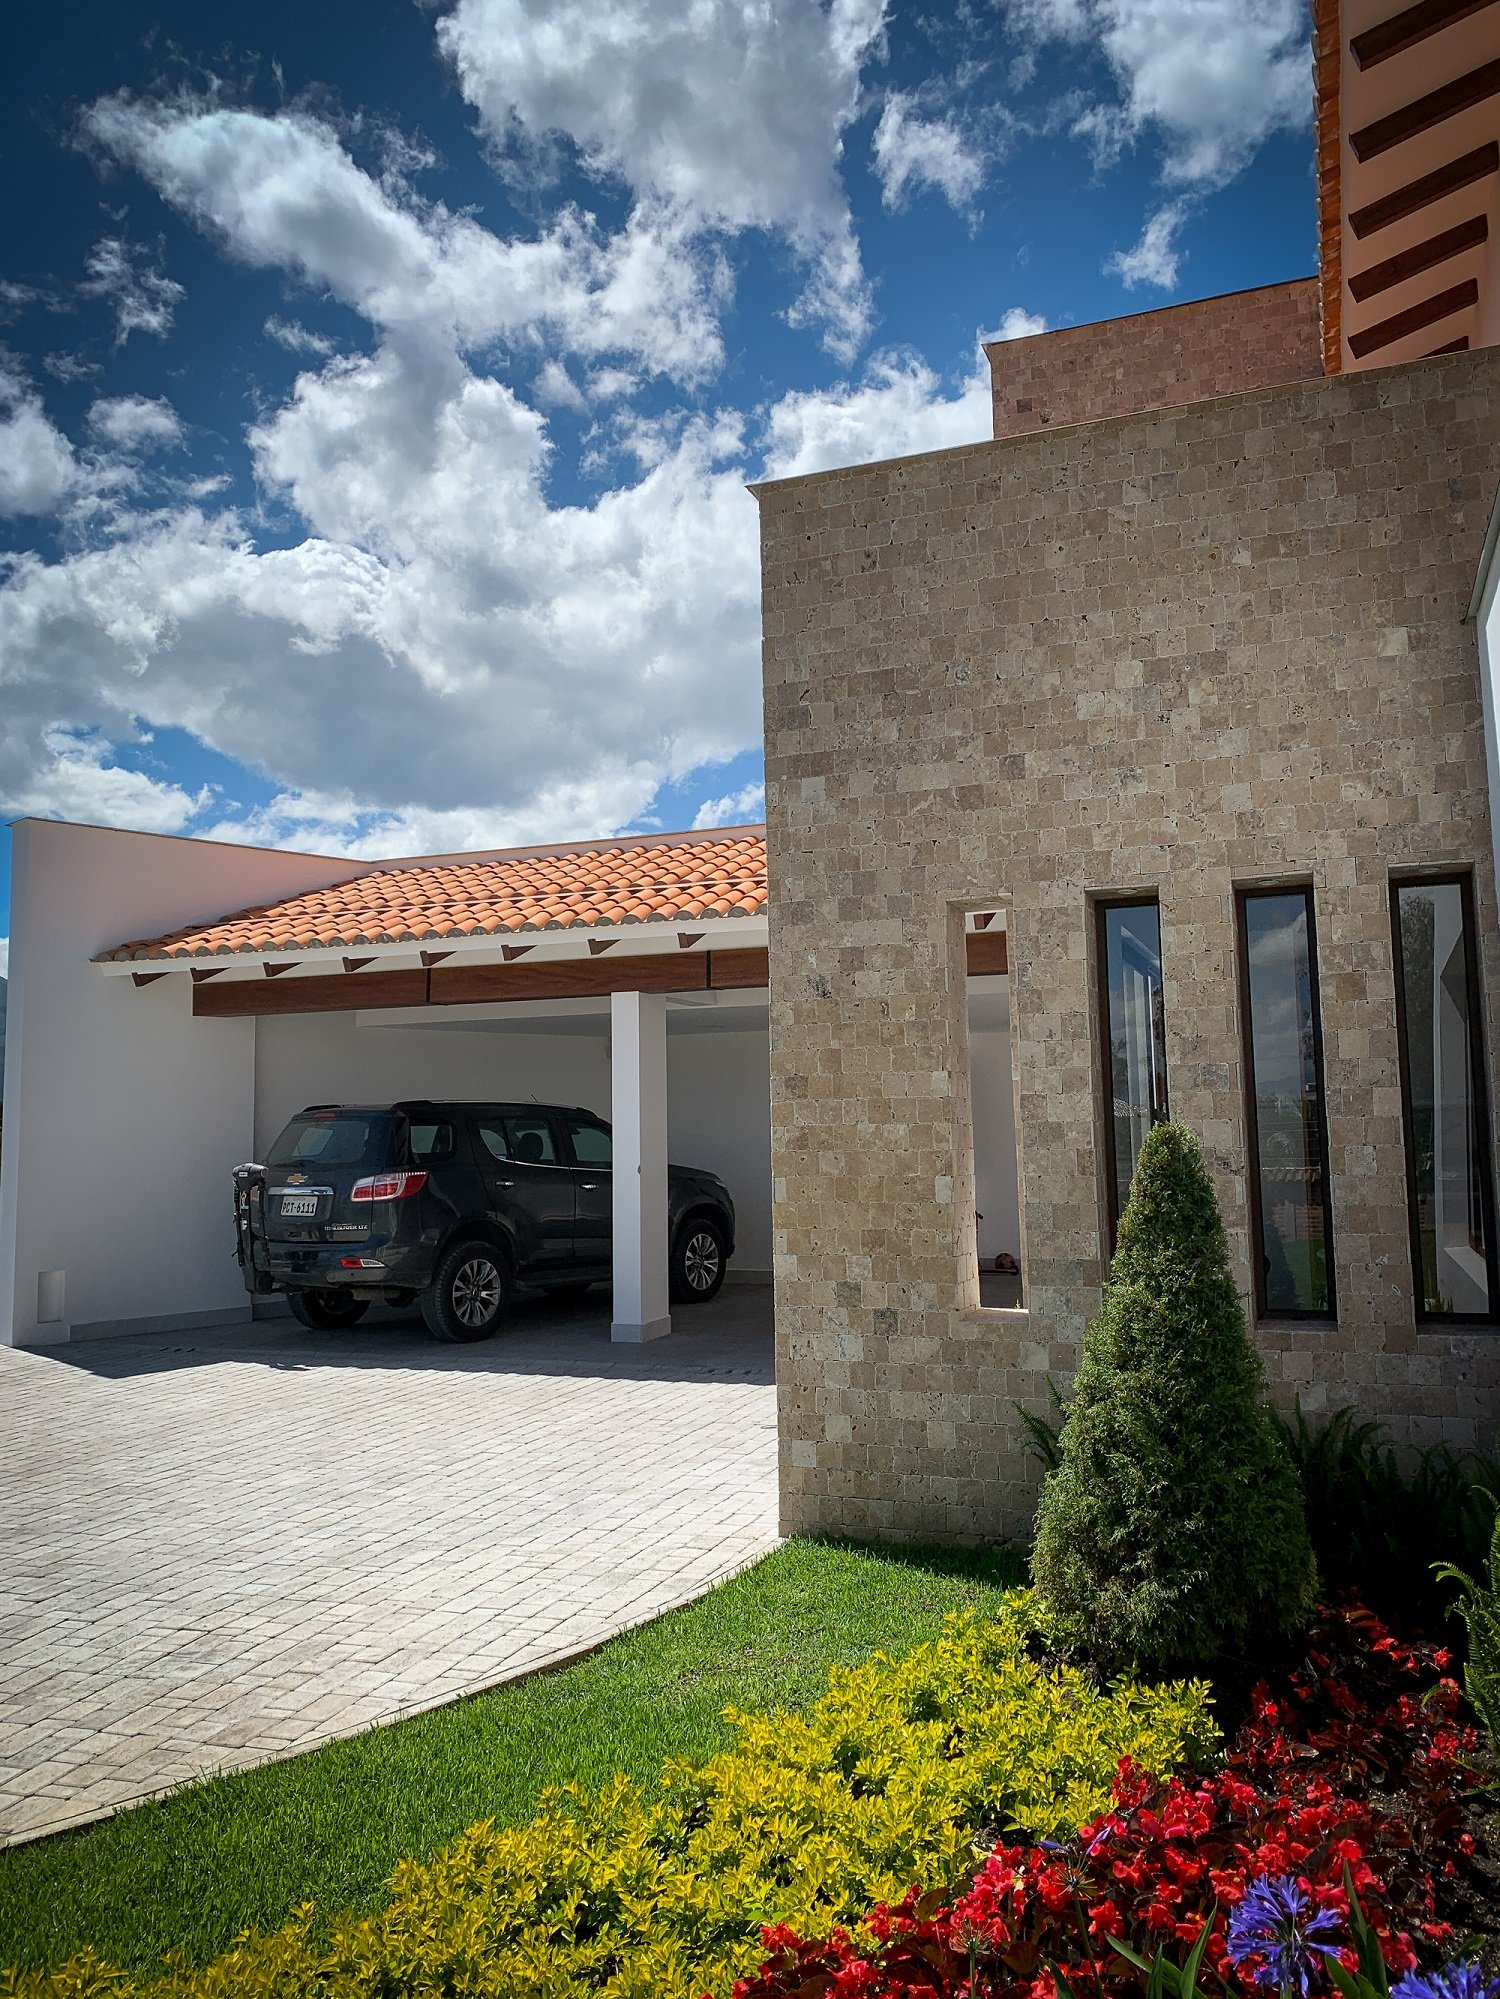 Casa-MG-Cumbaya-A3-Arquitectos-Quito-Ecuador